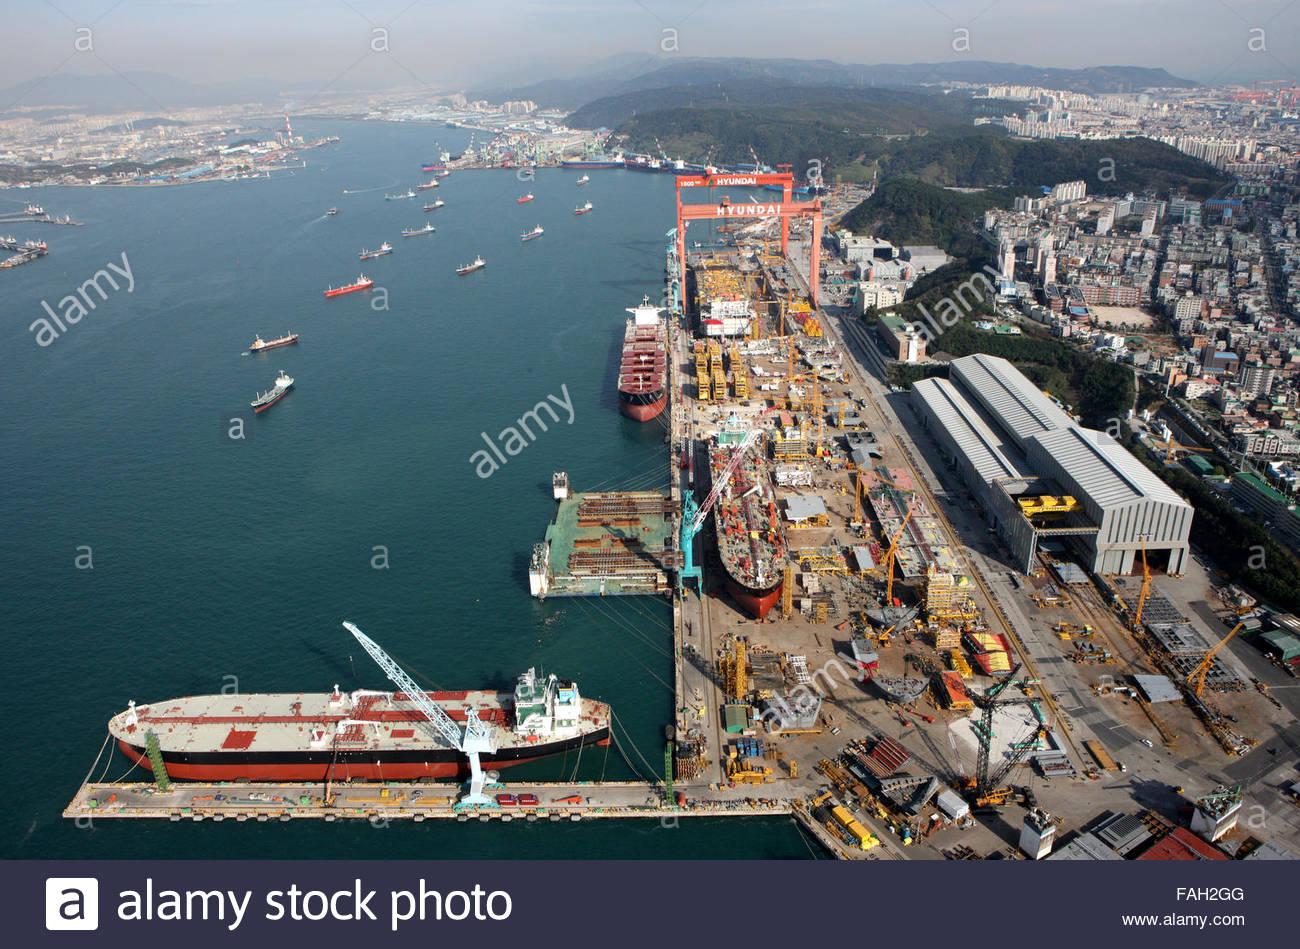 shipyard, Ulsan Metropolitan City - Stock Image